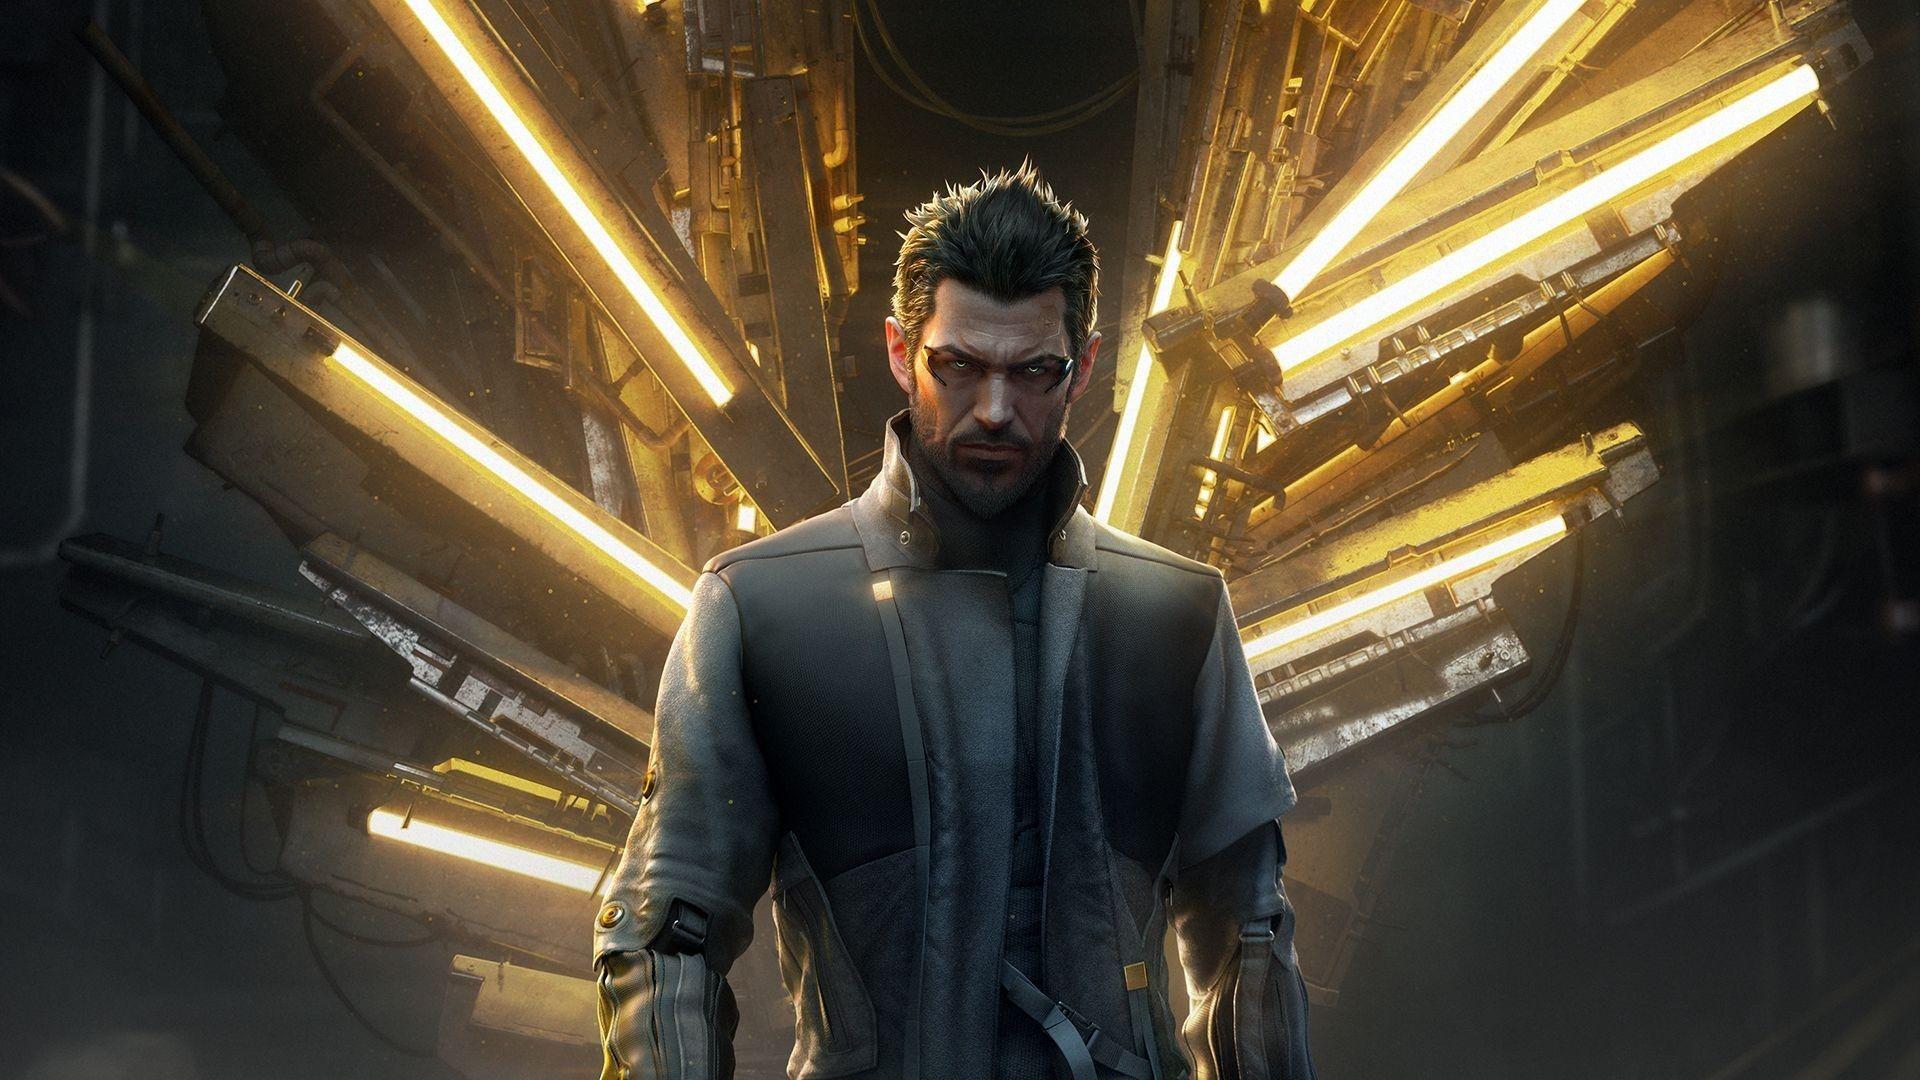 1920x1080 Deus Ex Mankind Divided Image Of Best Wallpaper Deus Ex